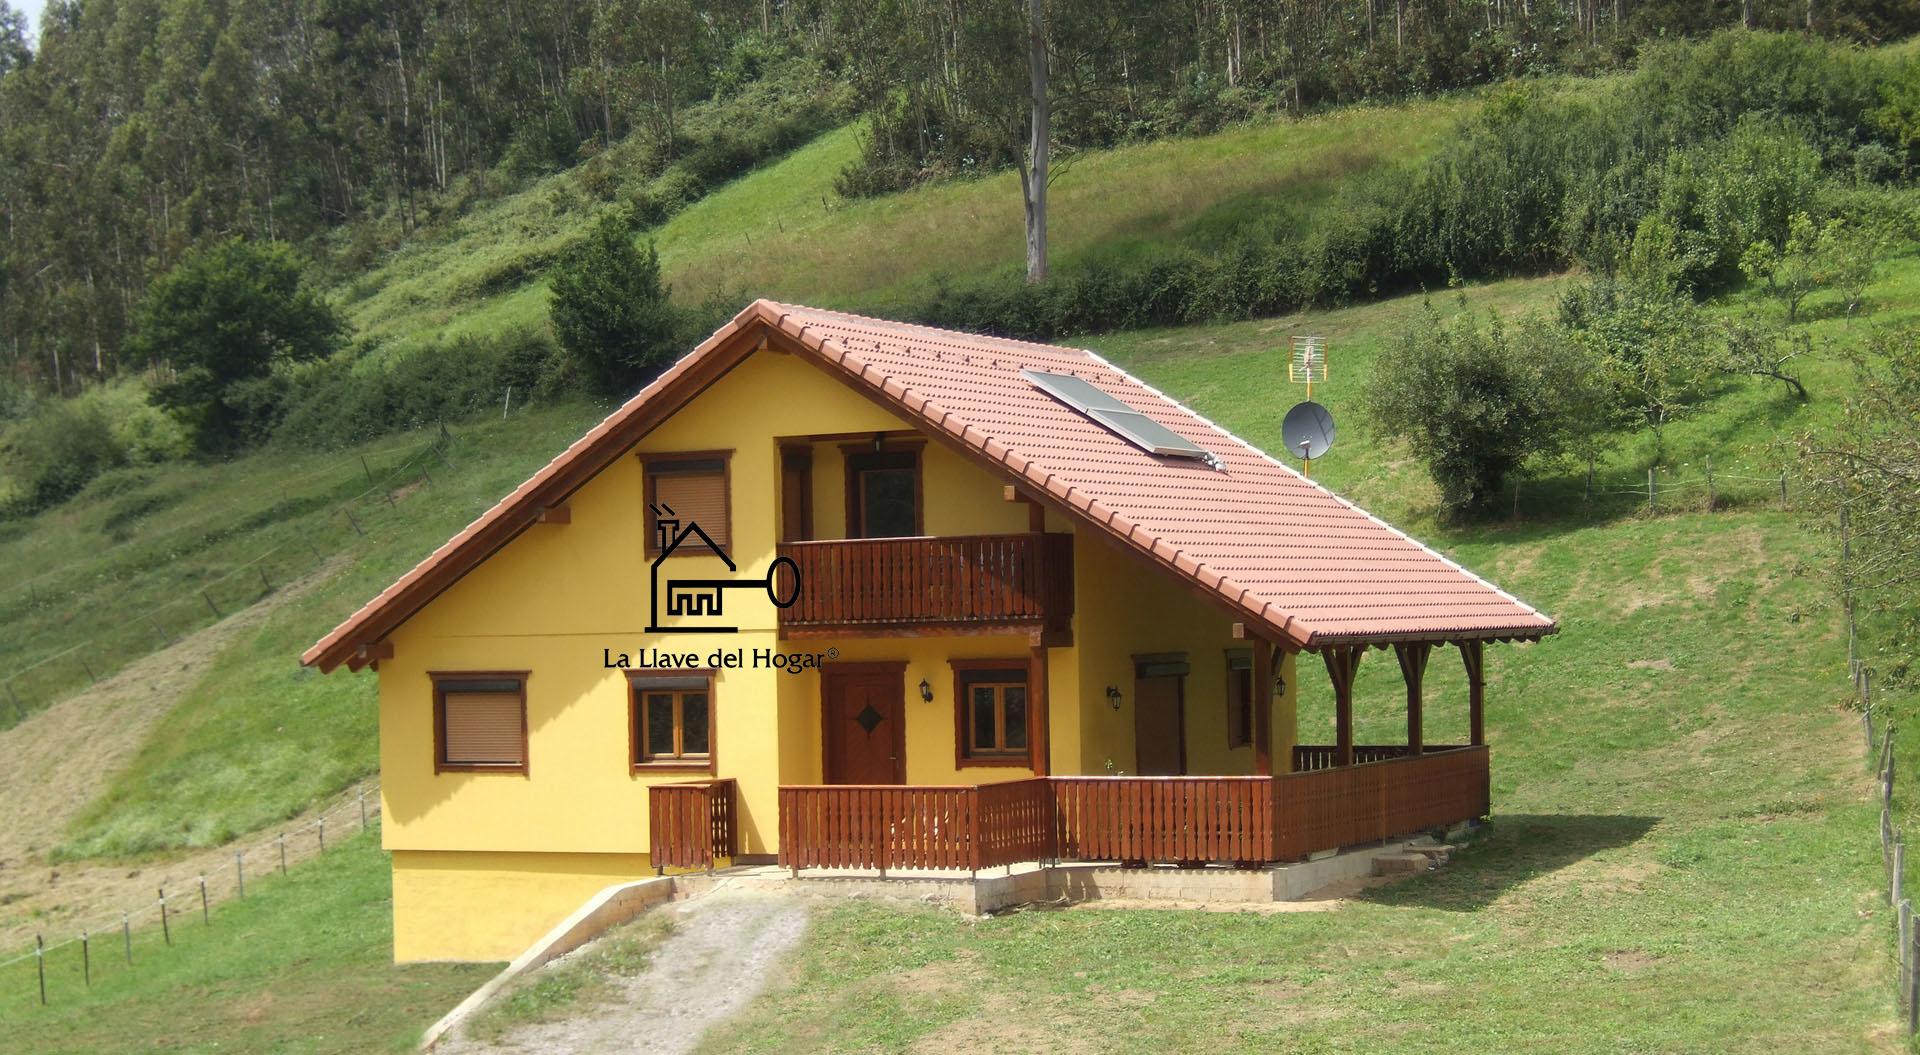 Casa de madera galicia beautiful joomla extension joomla - Casas de madera en galicia baratas ...